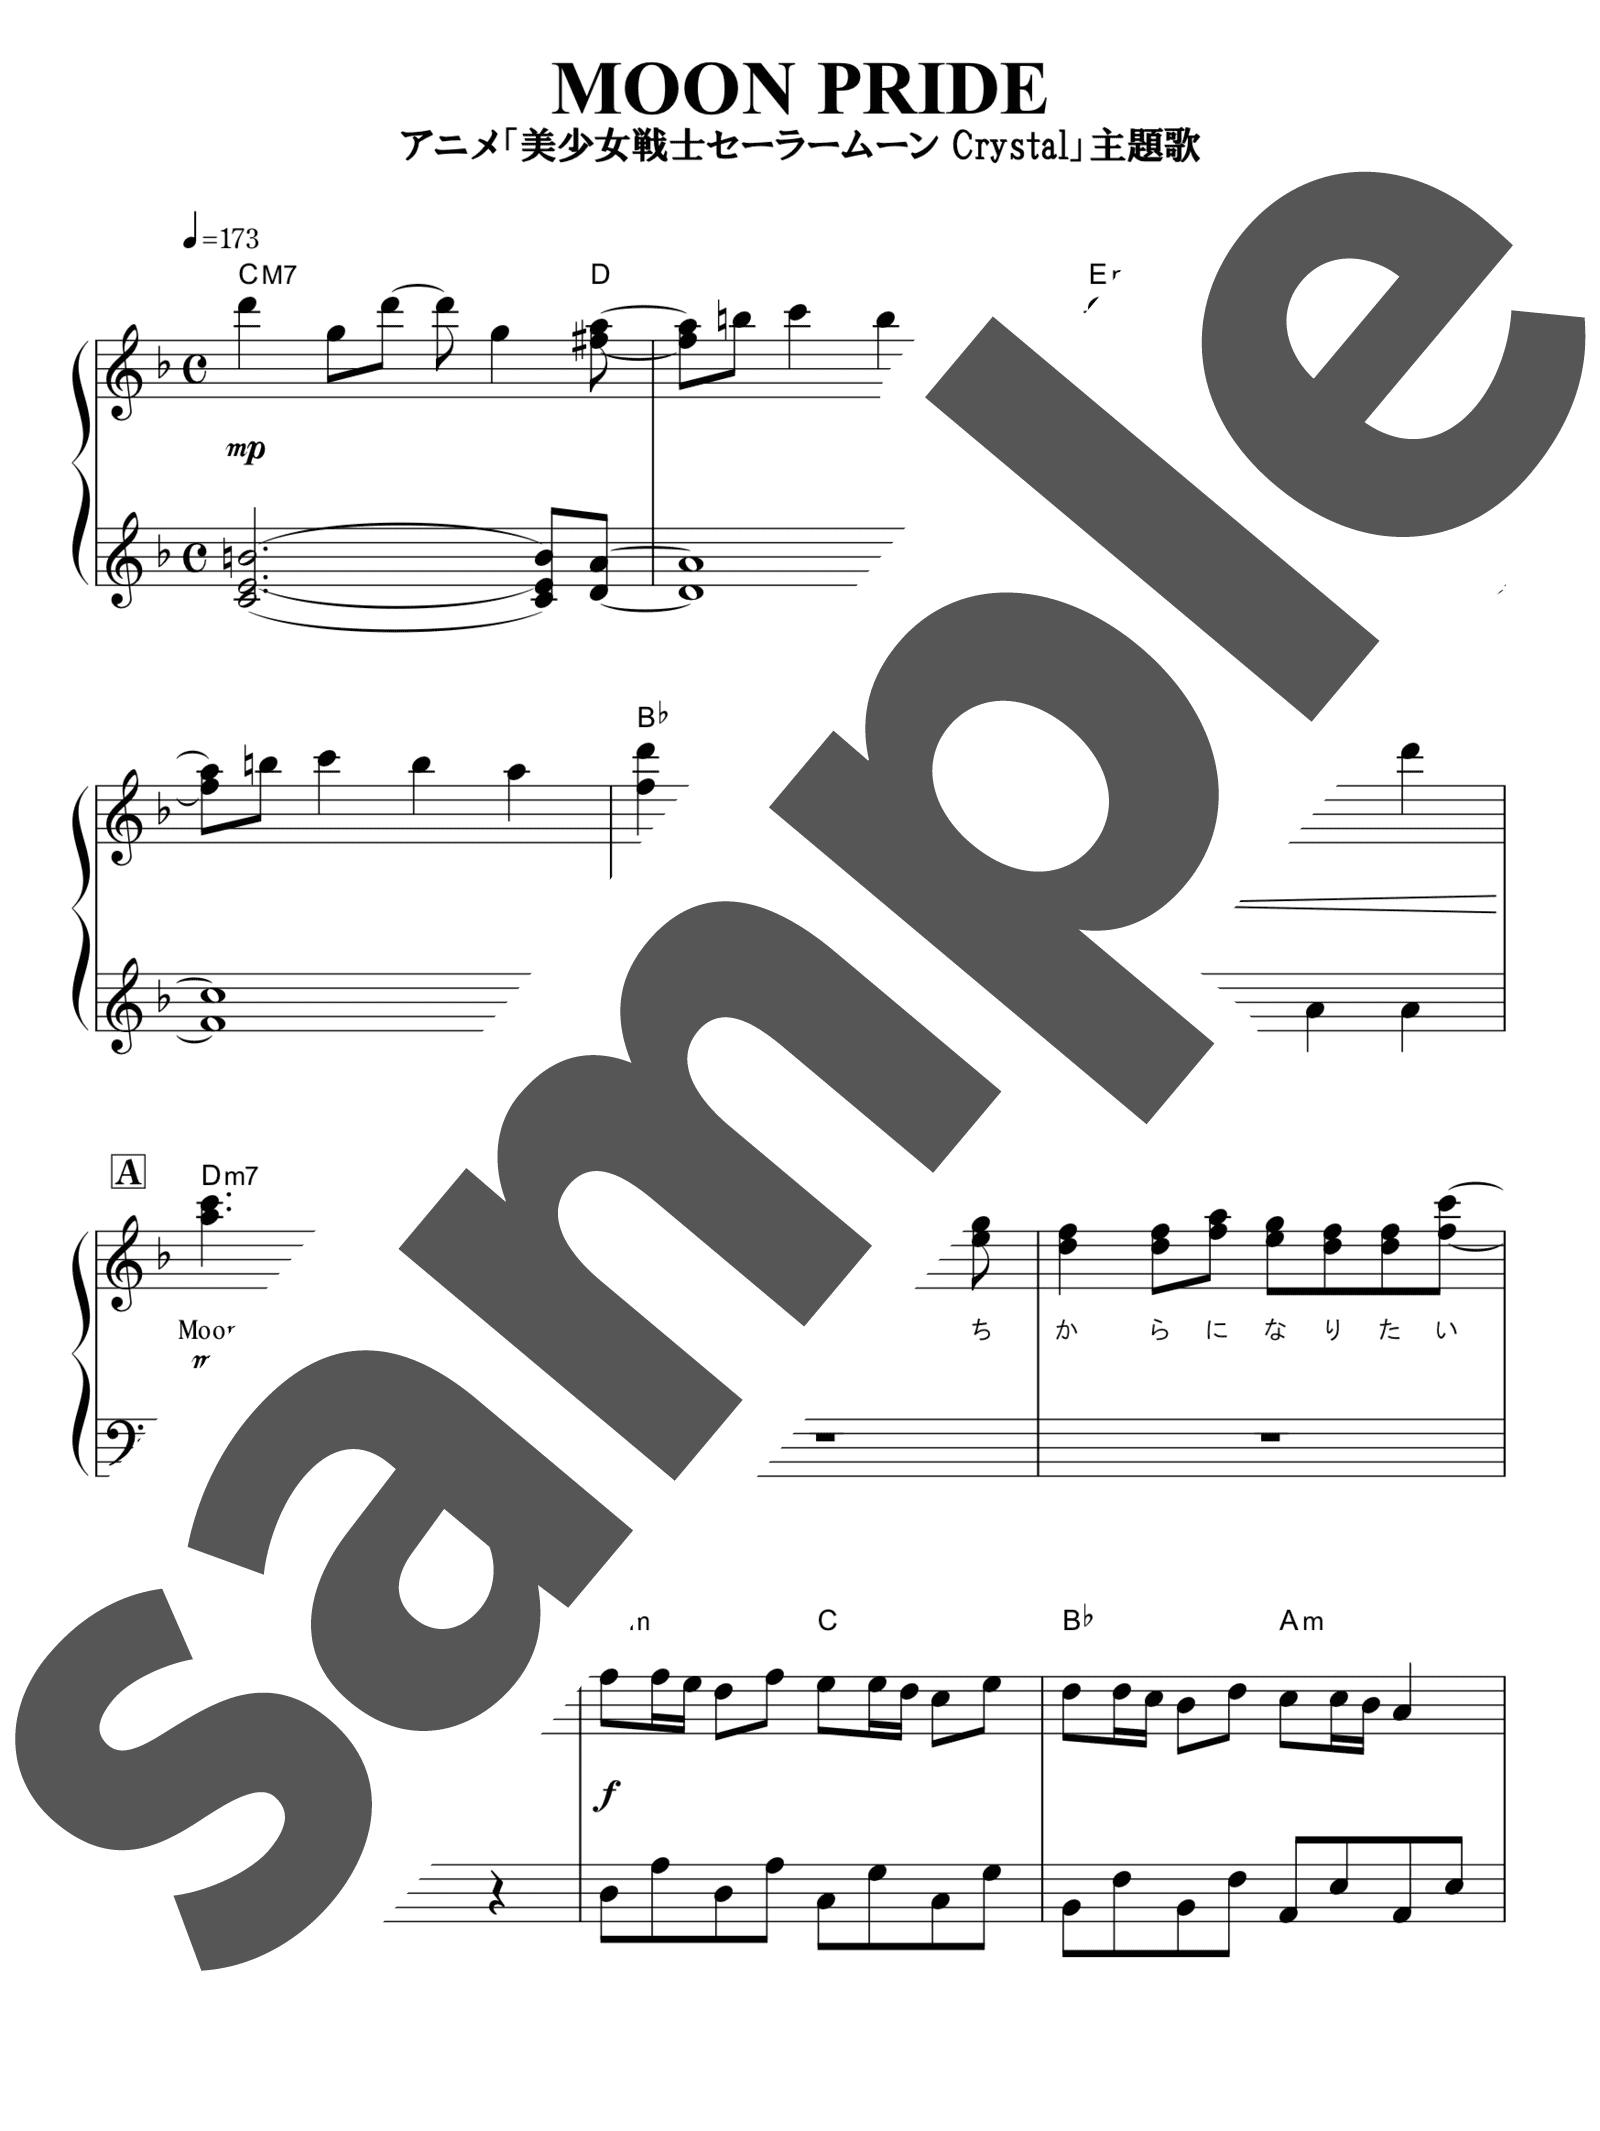 「MOON PRIDE」のサンプル楽譜